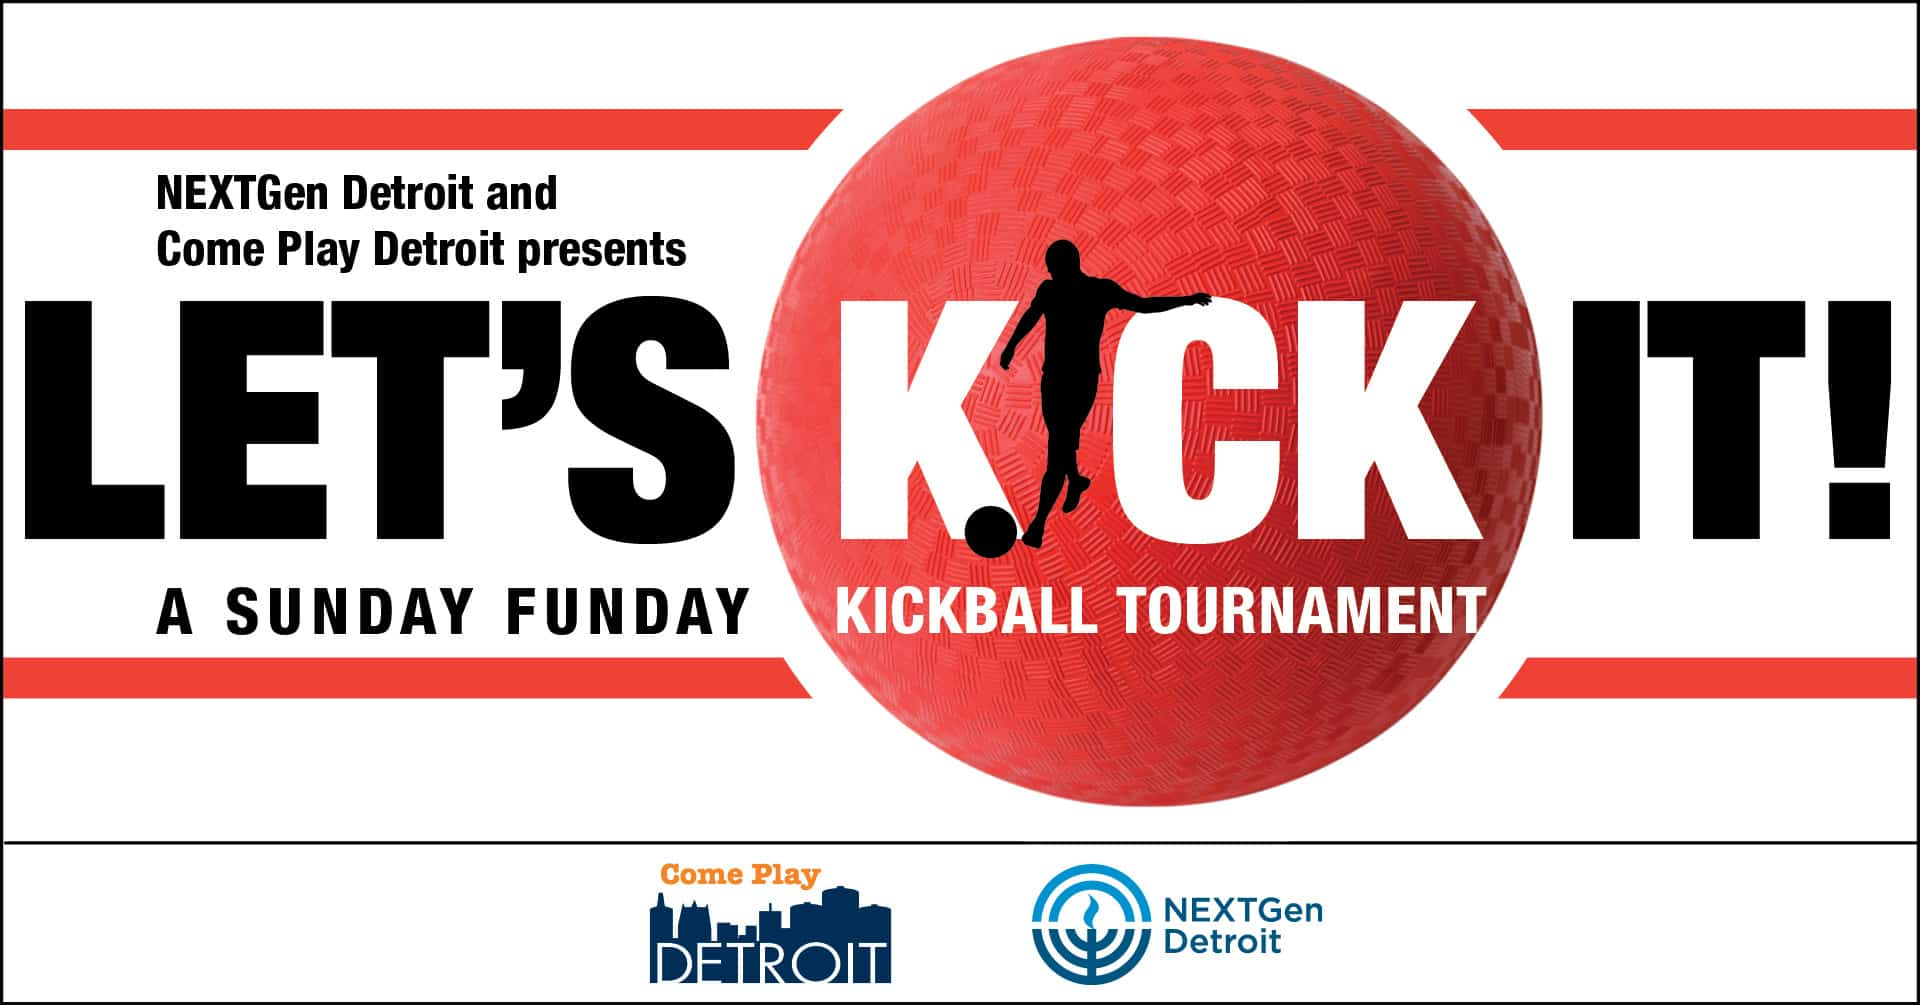 Let's Kick It!: A Sunday Funday Kickball Tournament